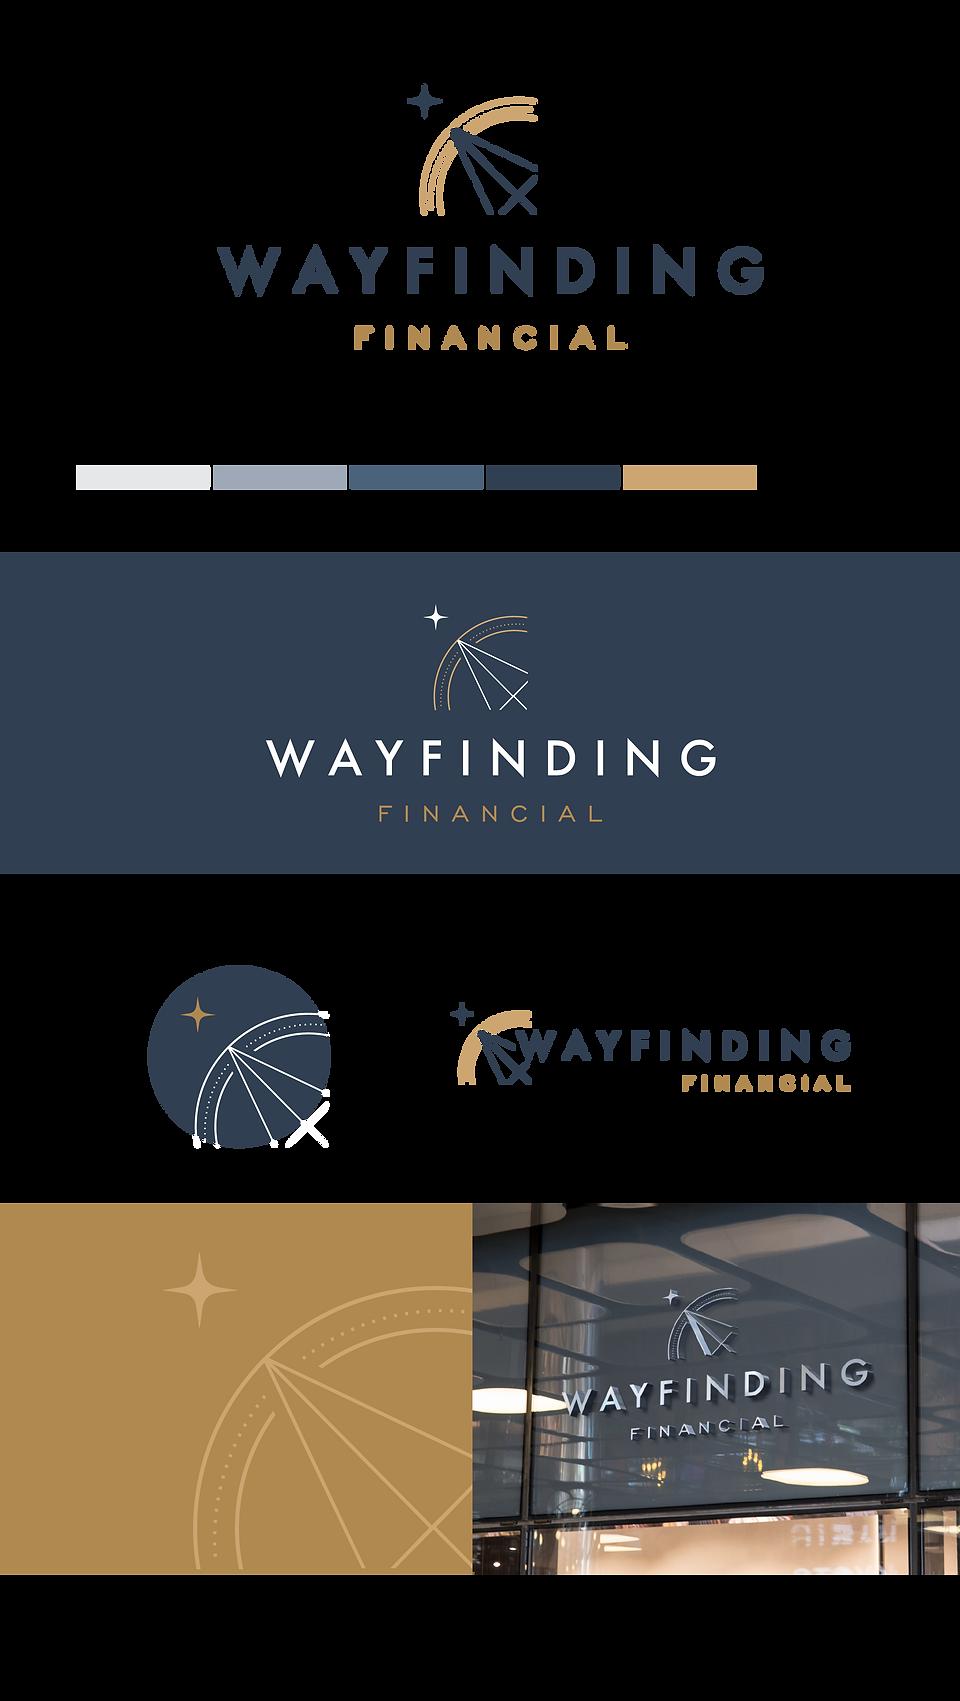 Wayfinding-01.png